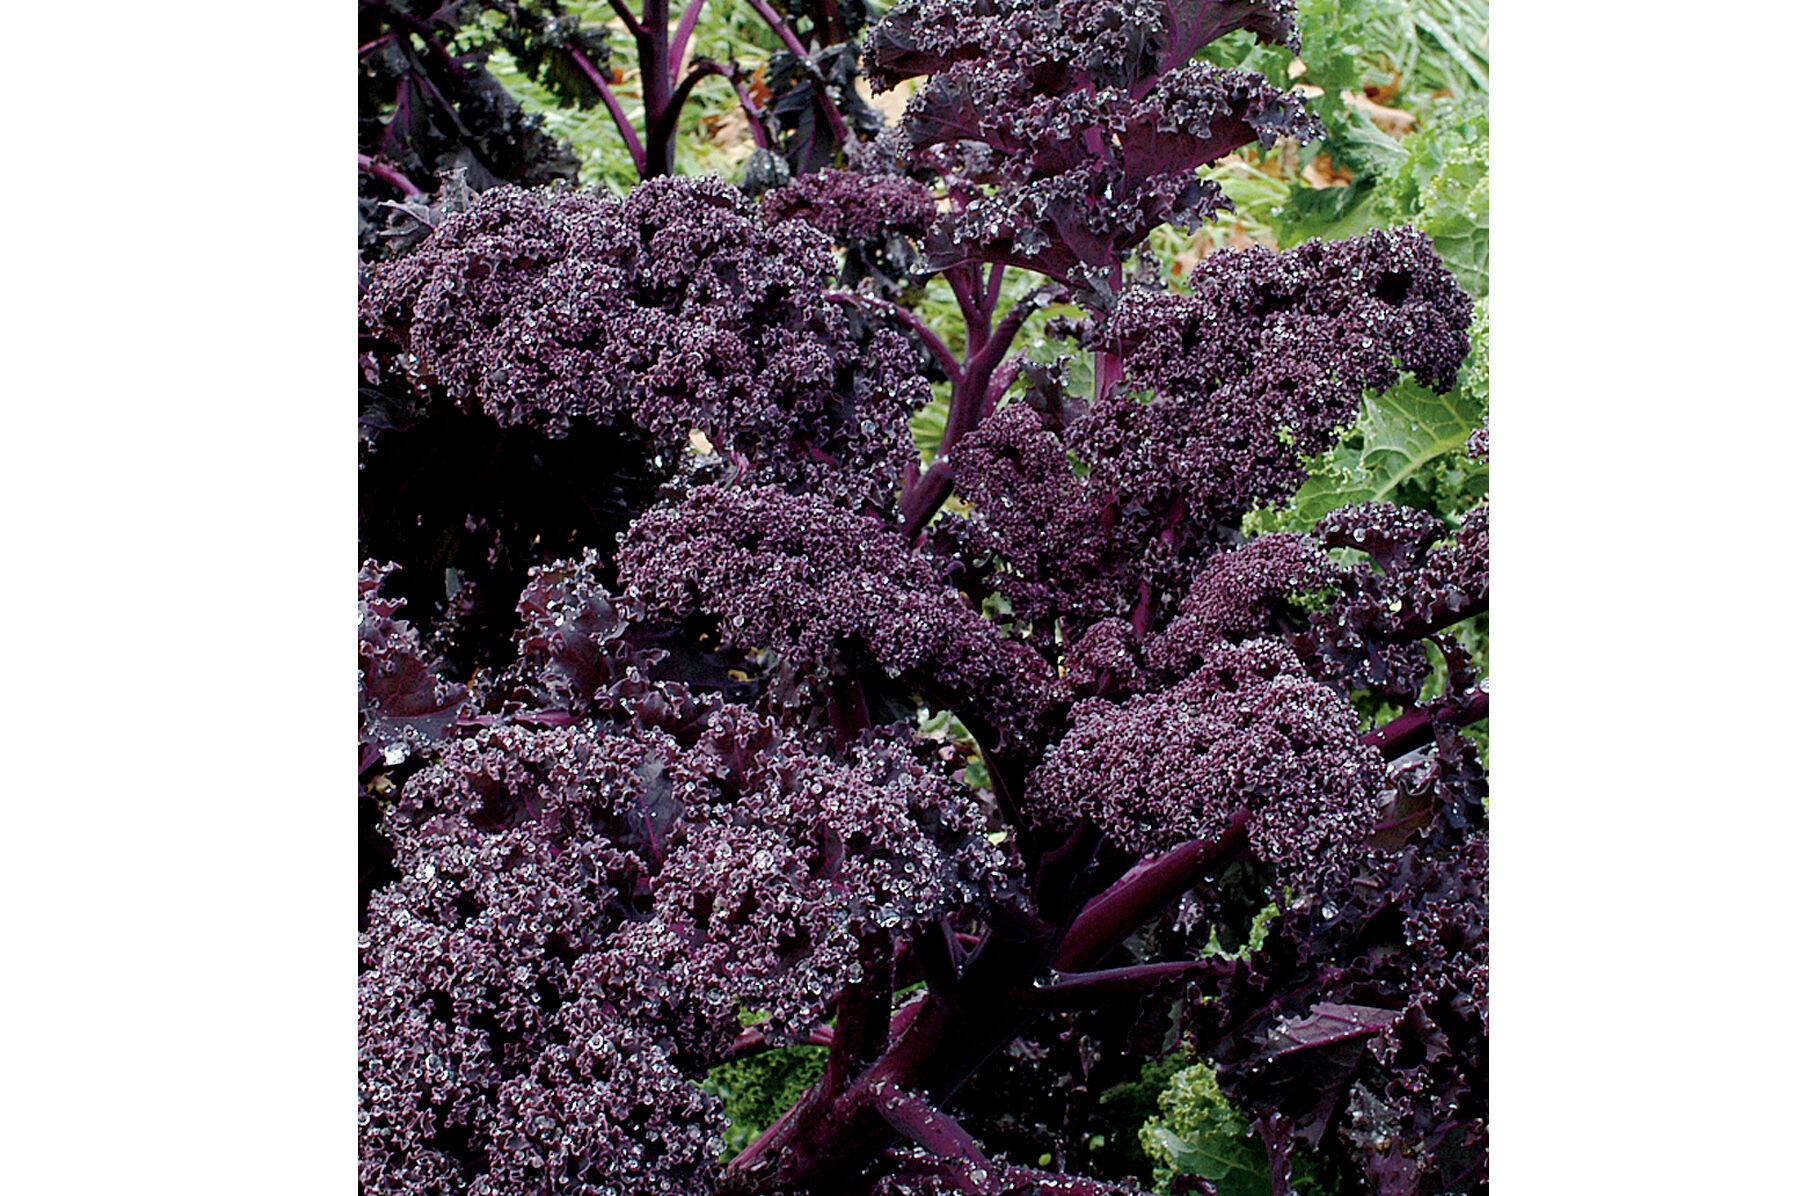 Amazon.com : Purple Curly Kale/Leafy Cabbage 'Scarlet' (Brassica ...